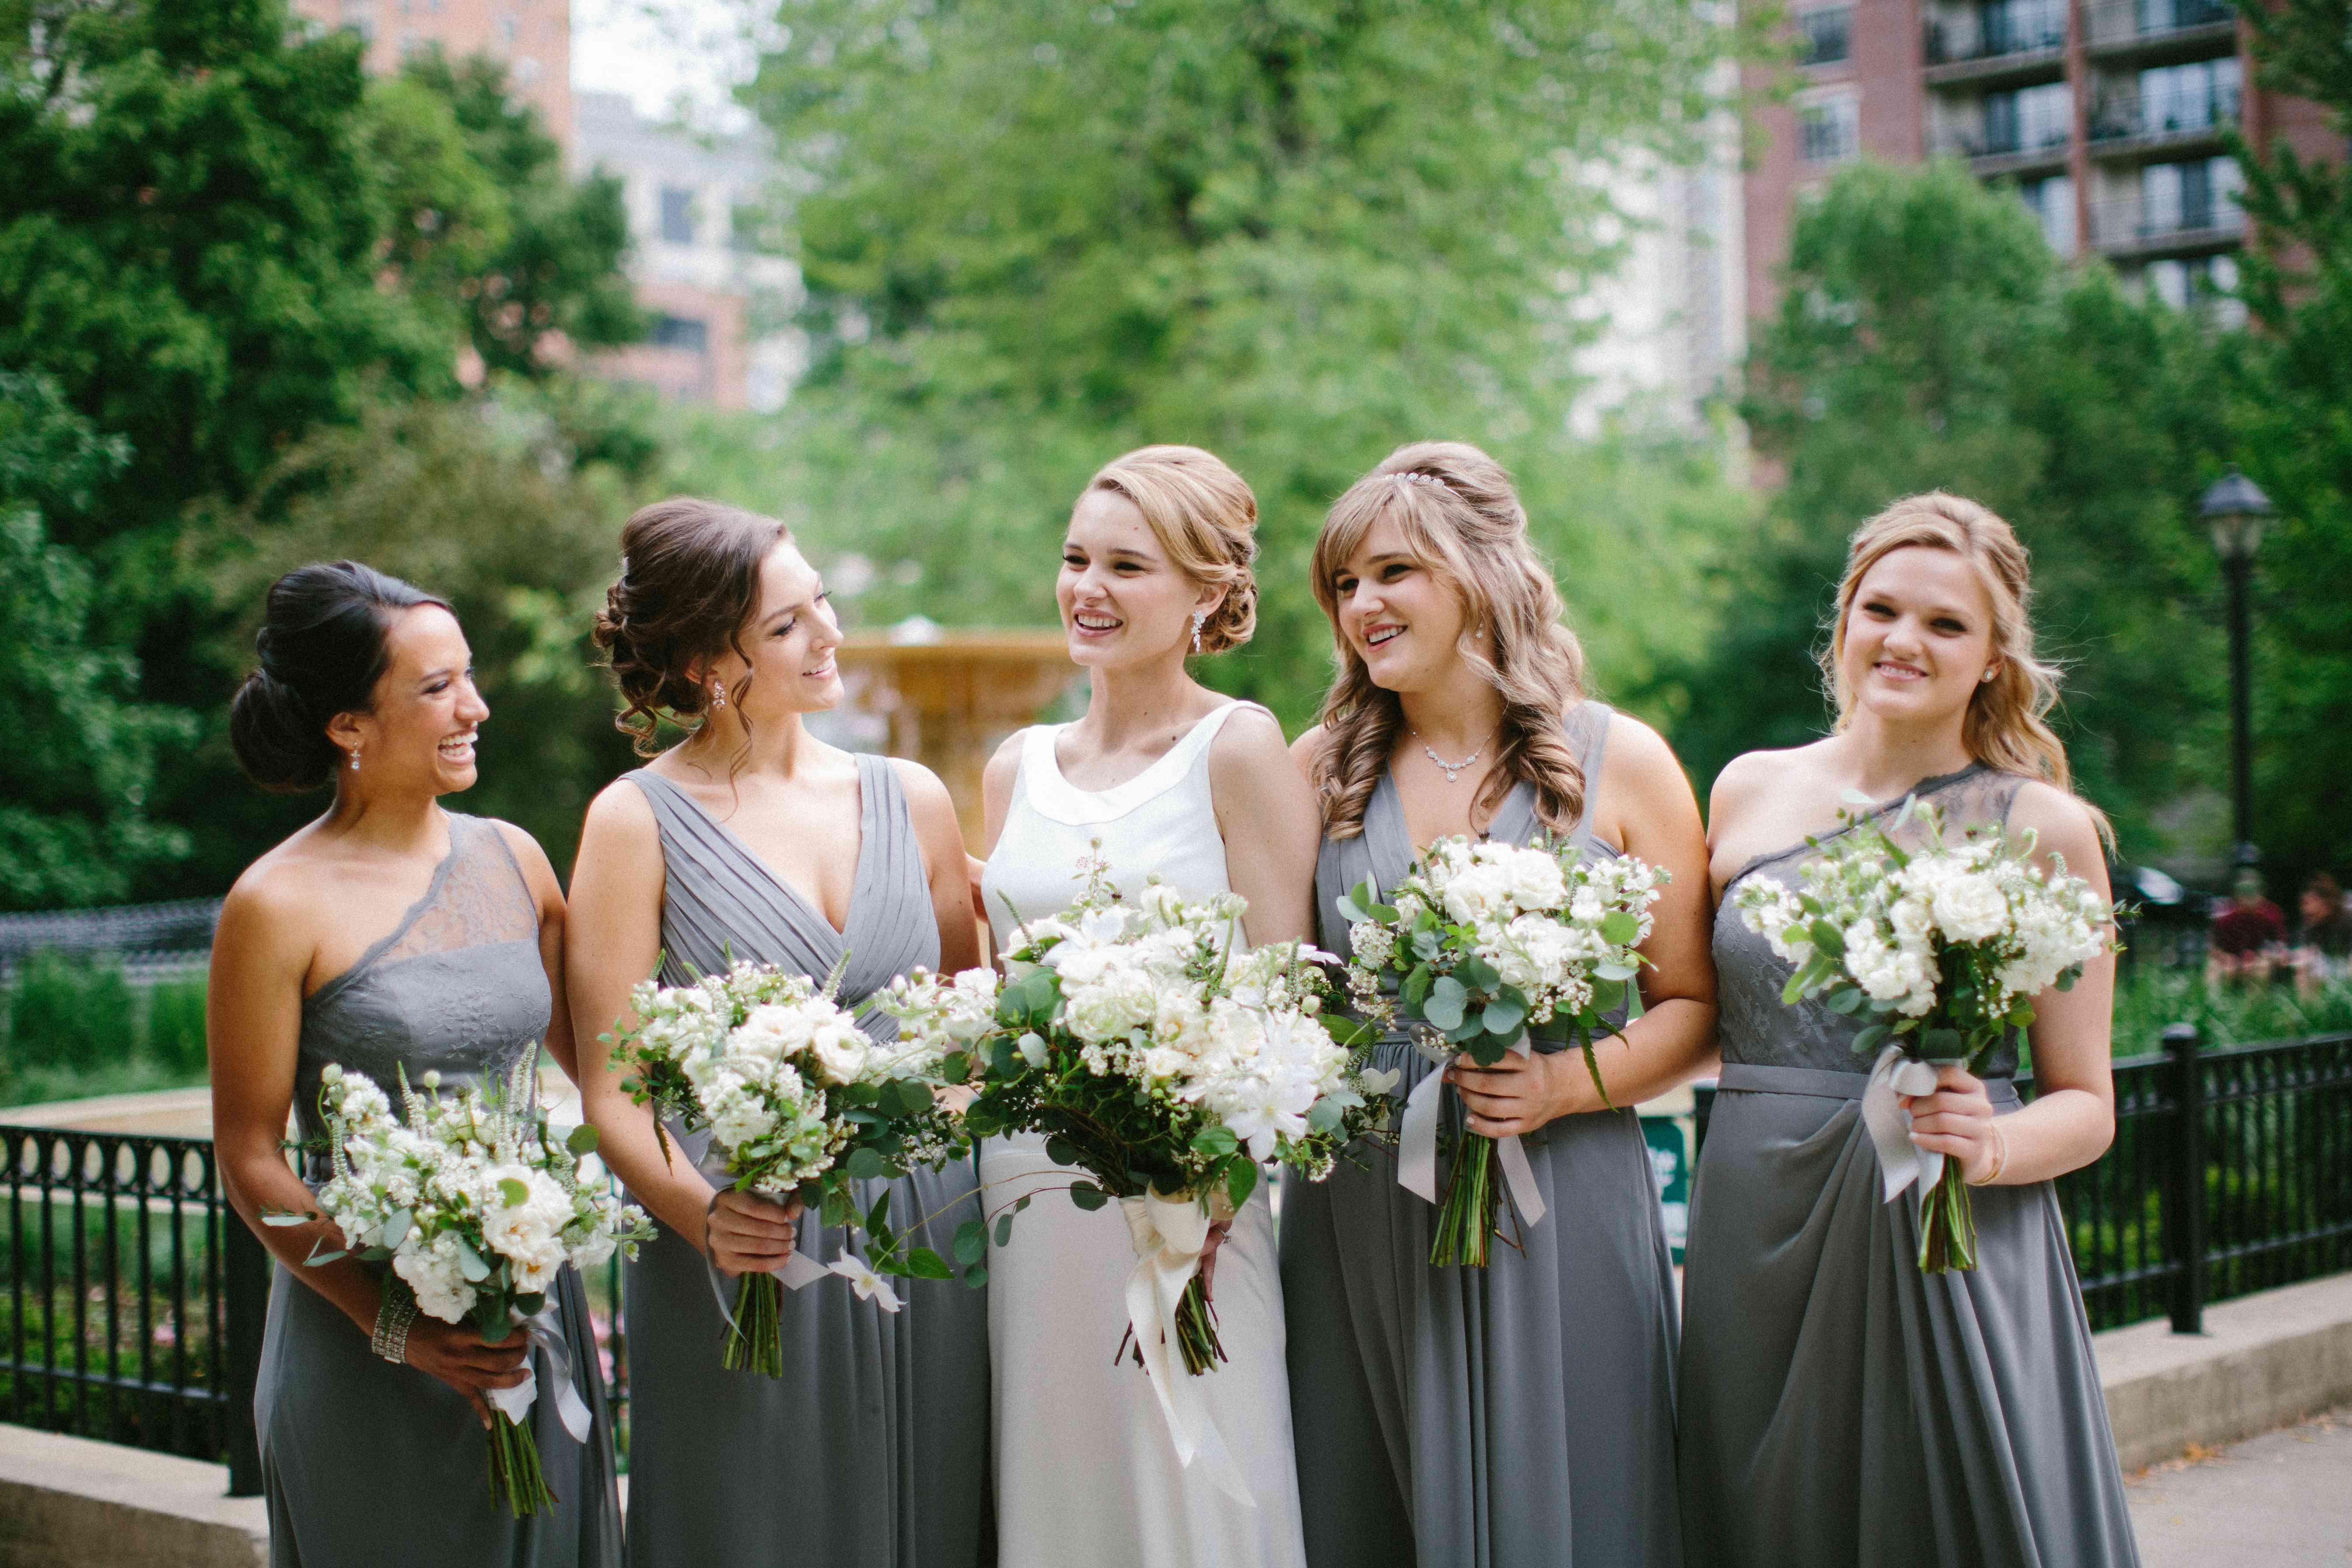 Bridal Party in Grey Bridesmaid Dresses